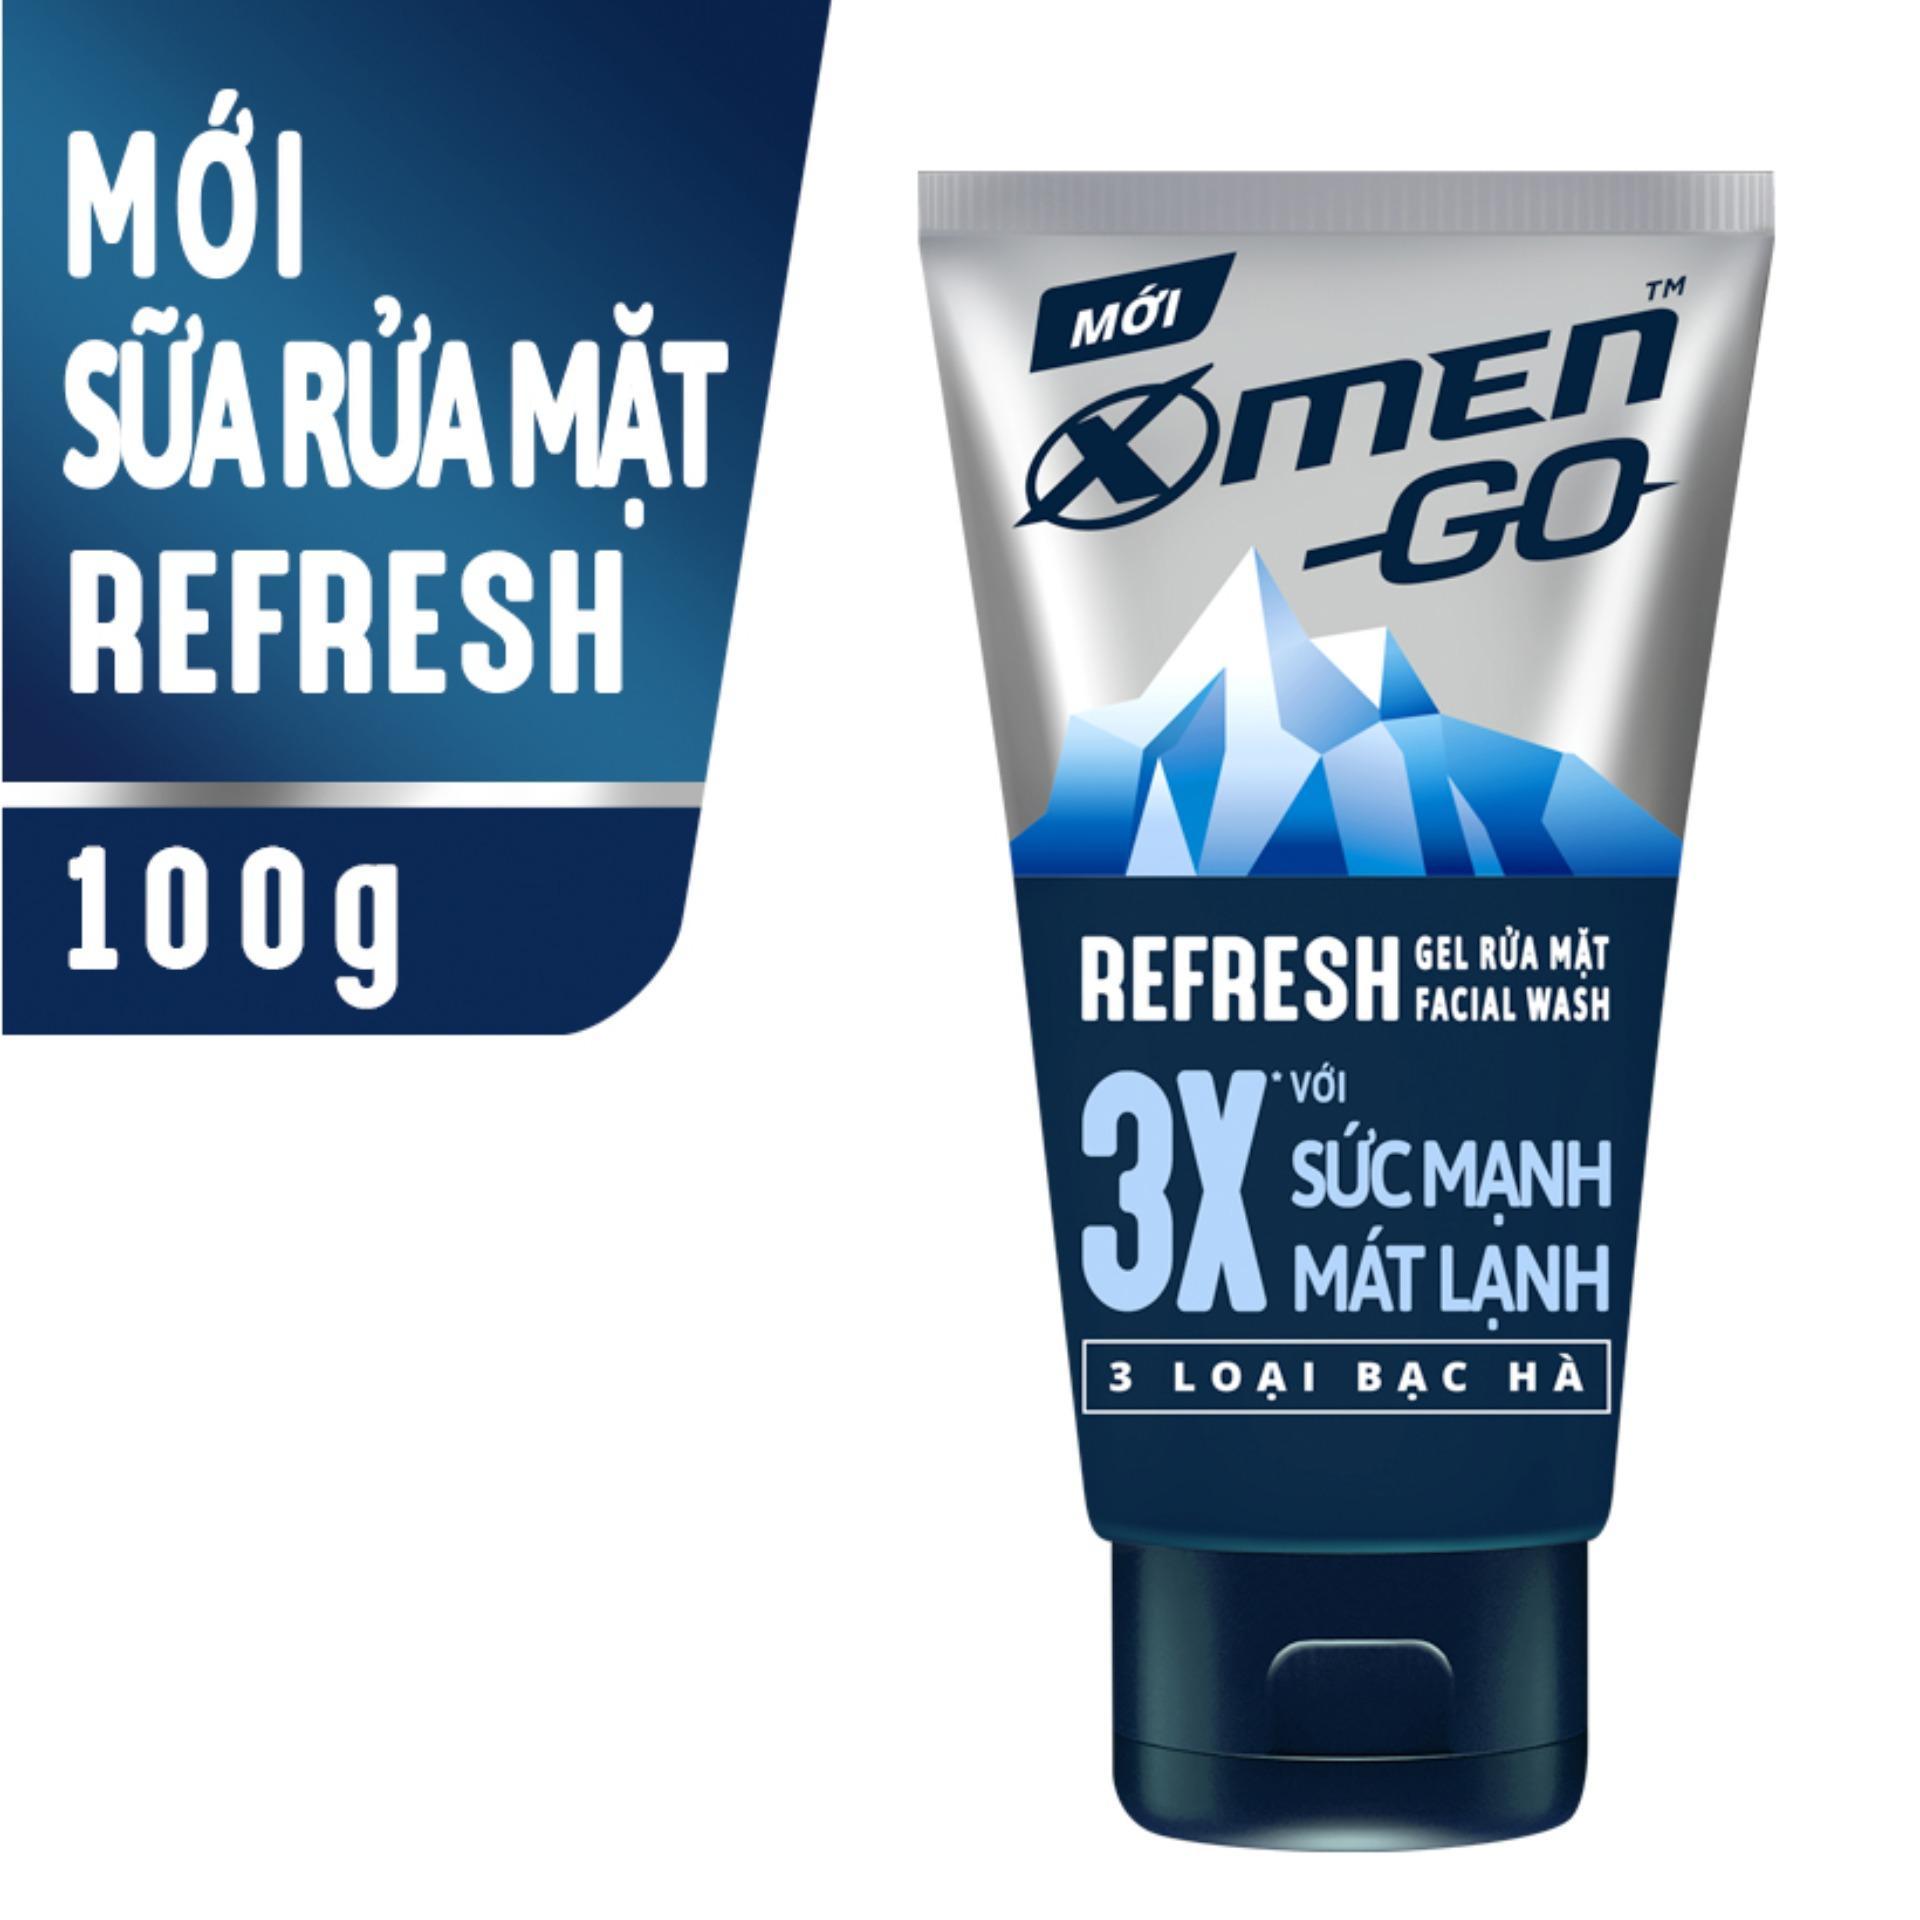 Sữa rửa mặt X-Men Go REFRESH 3 Loại Bạc Hà 100G